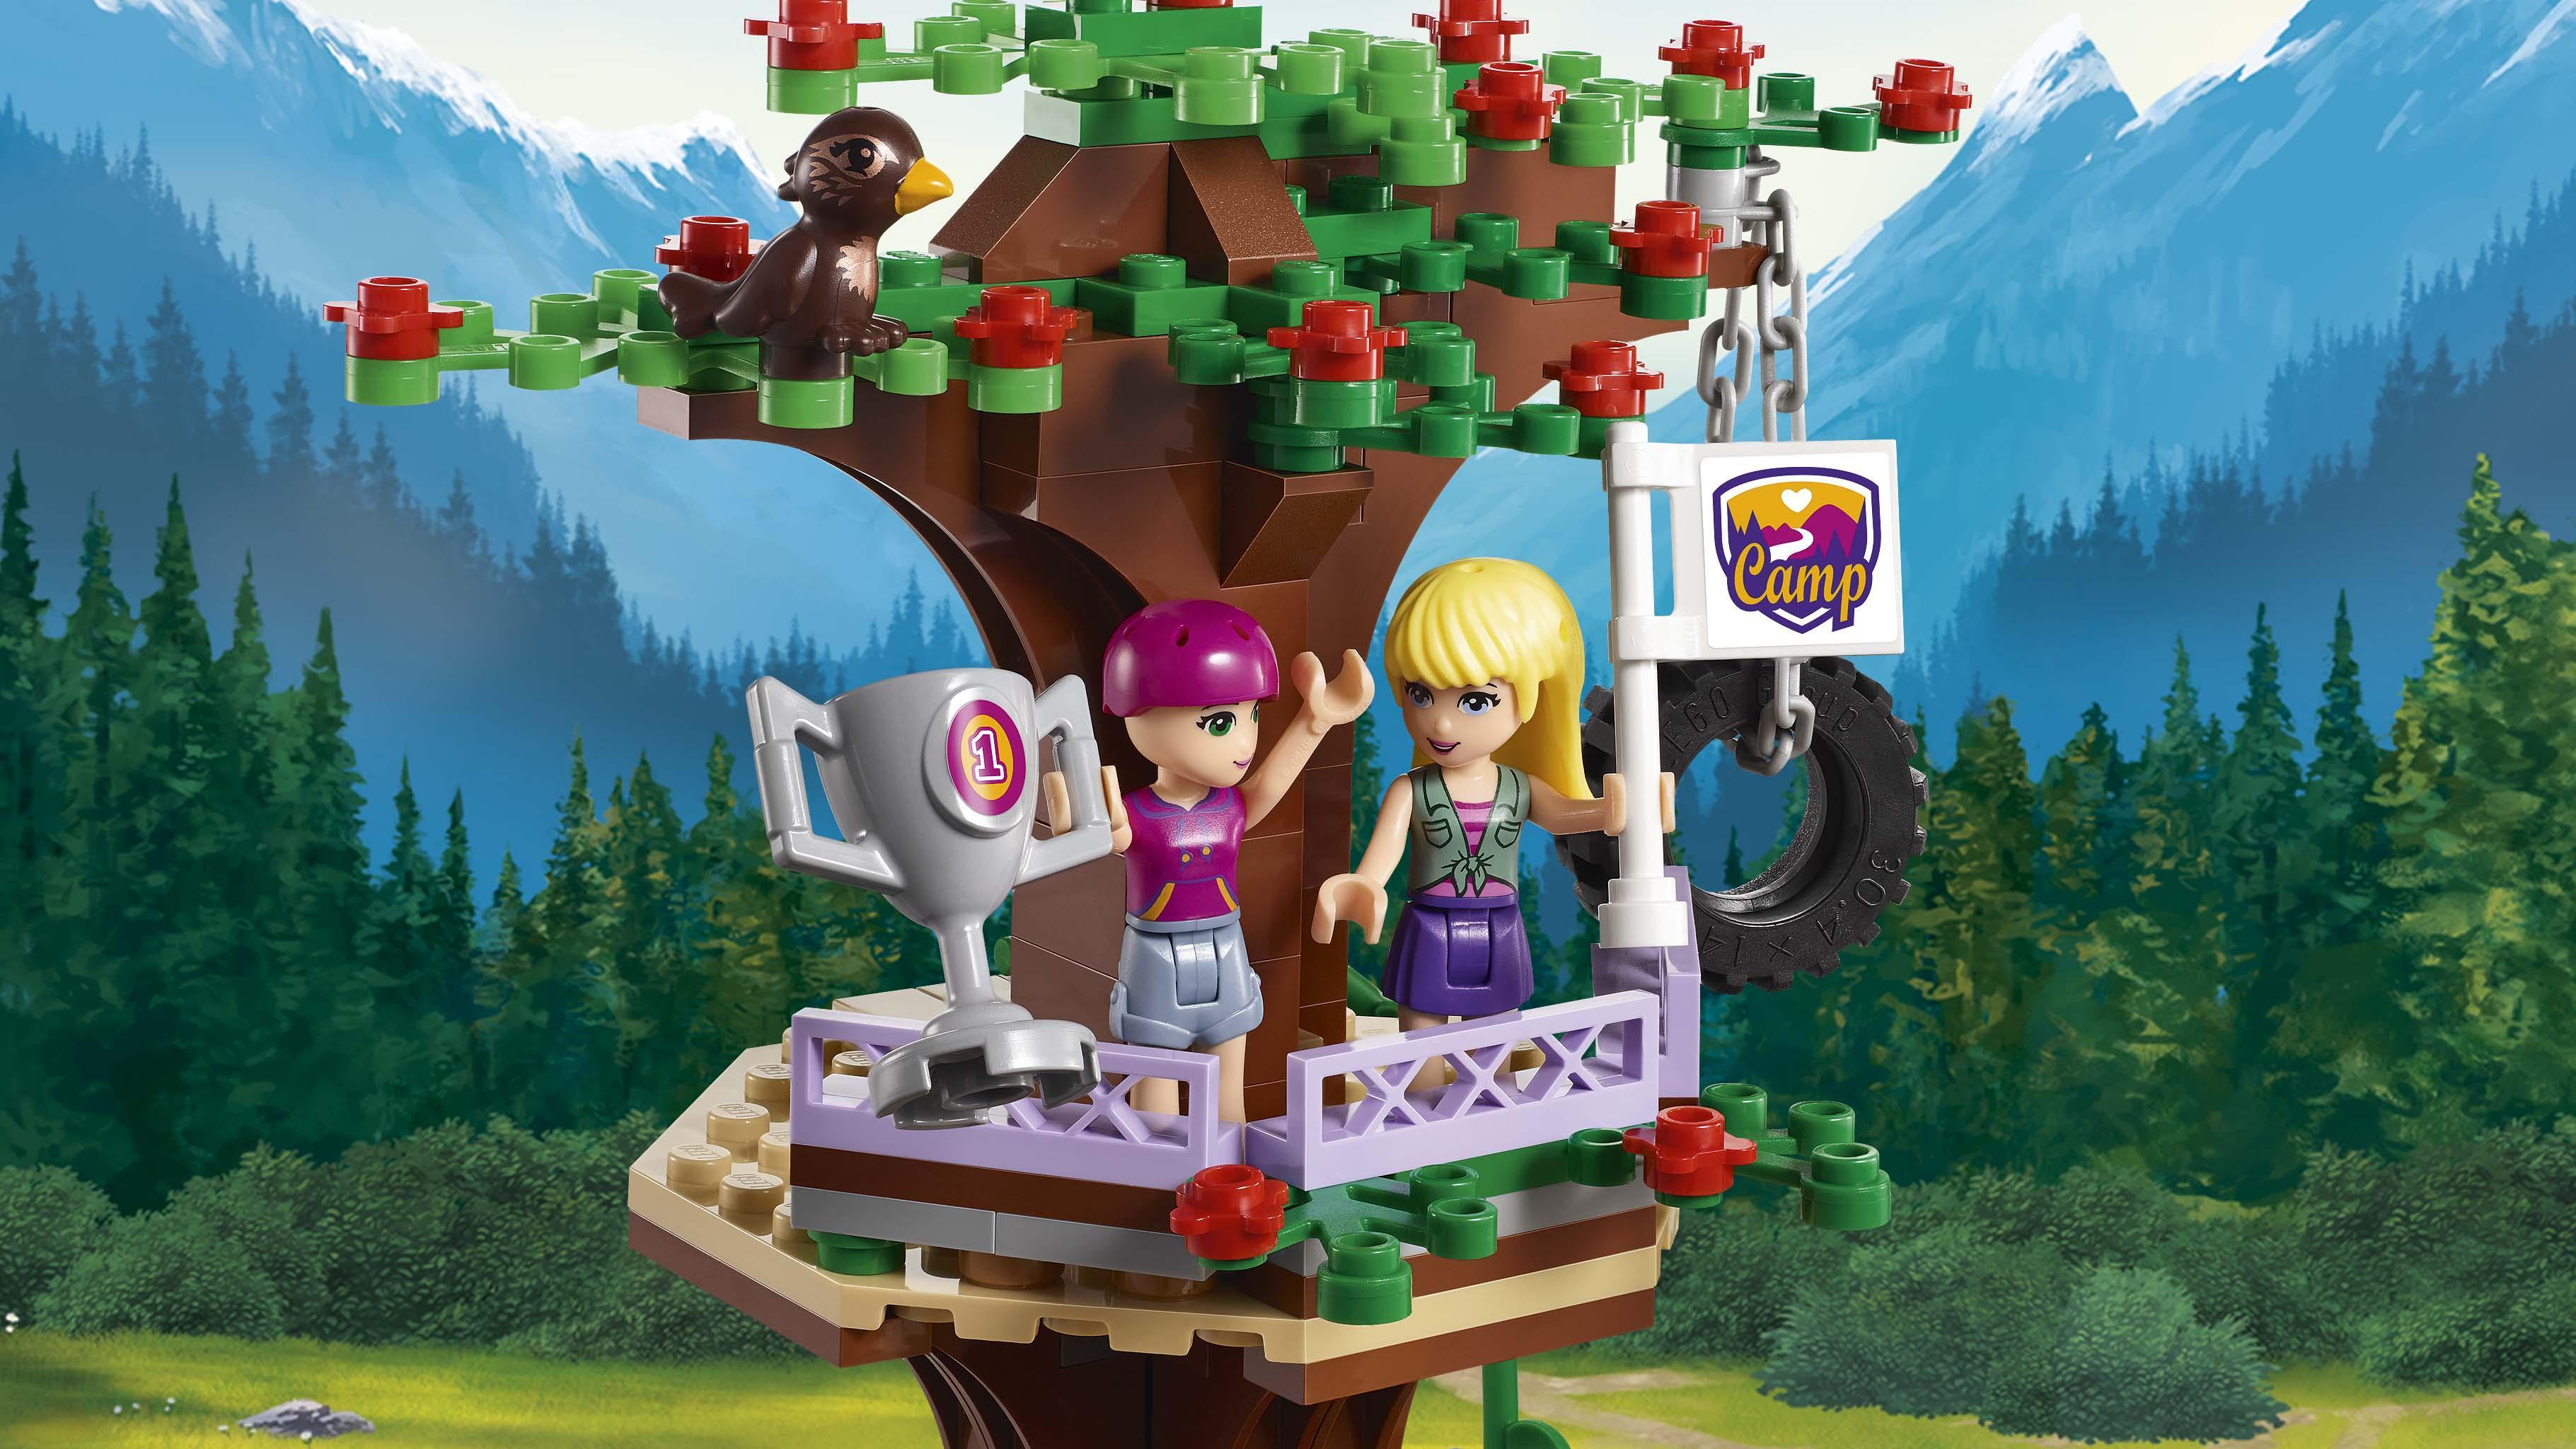 LEGO Friends Adventure Camp Tree House Building Kit (726 ...